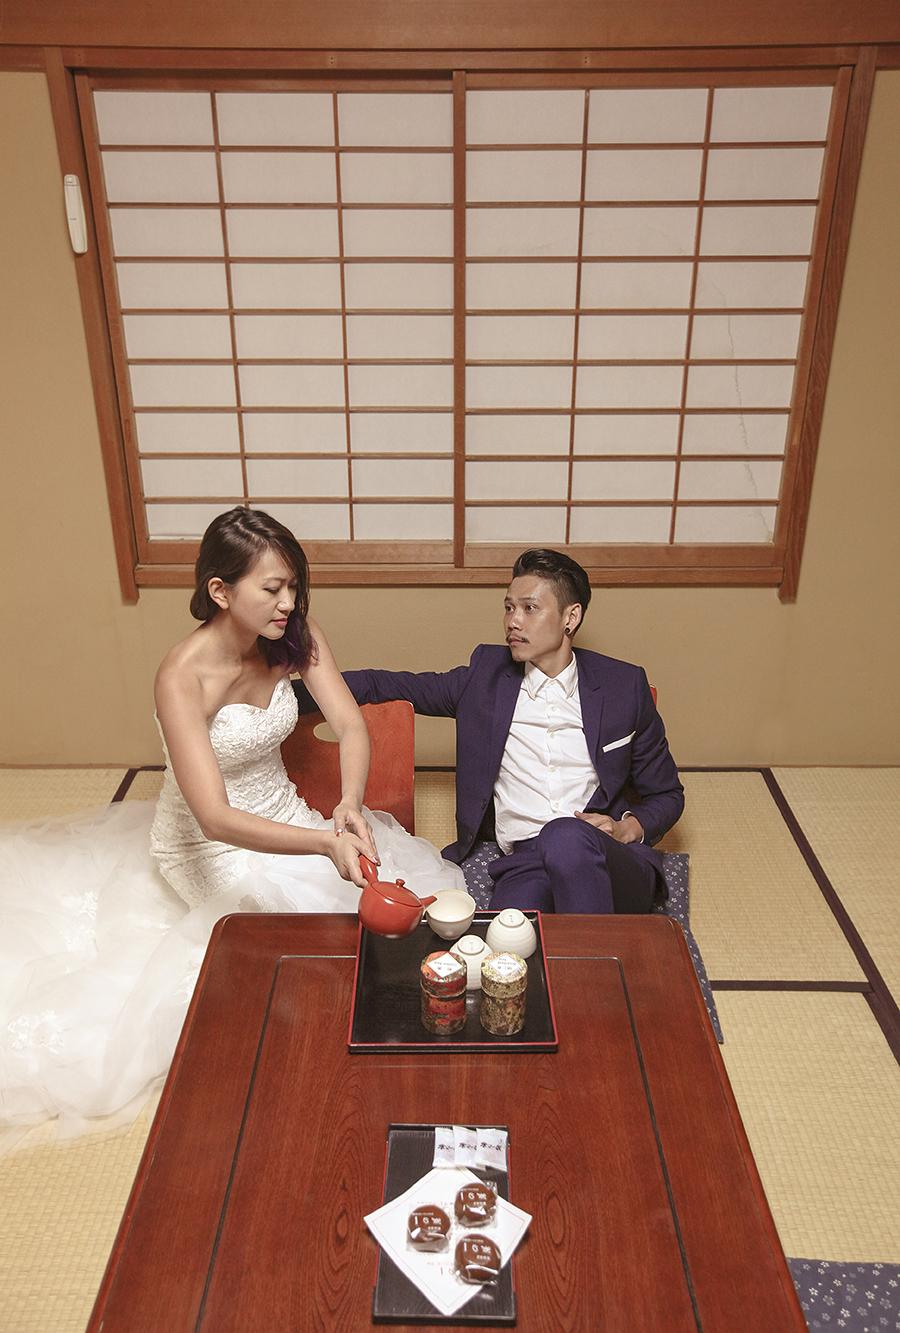 tokyo hakone japan spring sakura . engagement wedding photography by kurt ahs . ns + eu . 0389.jpg